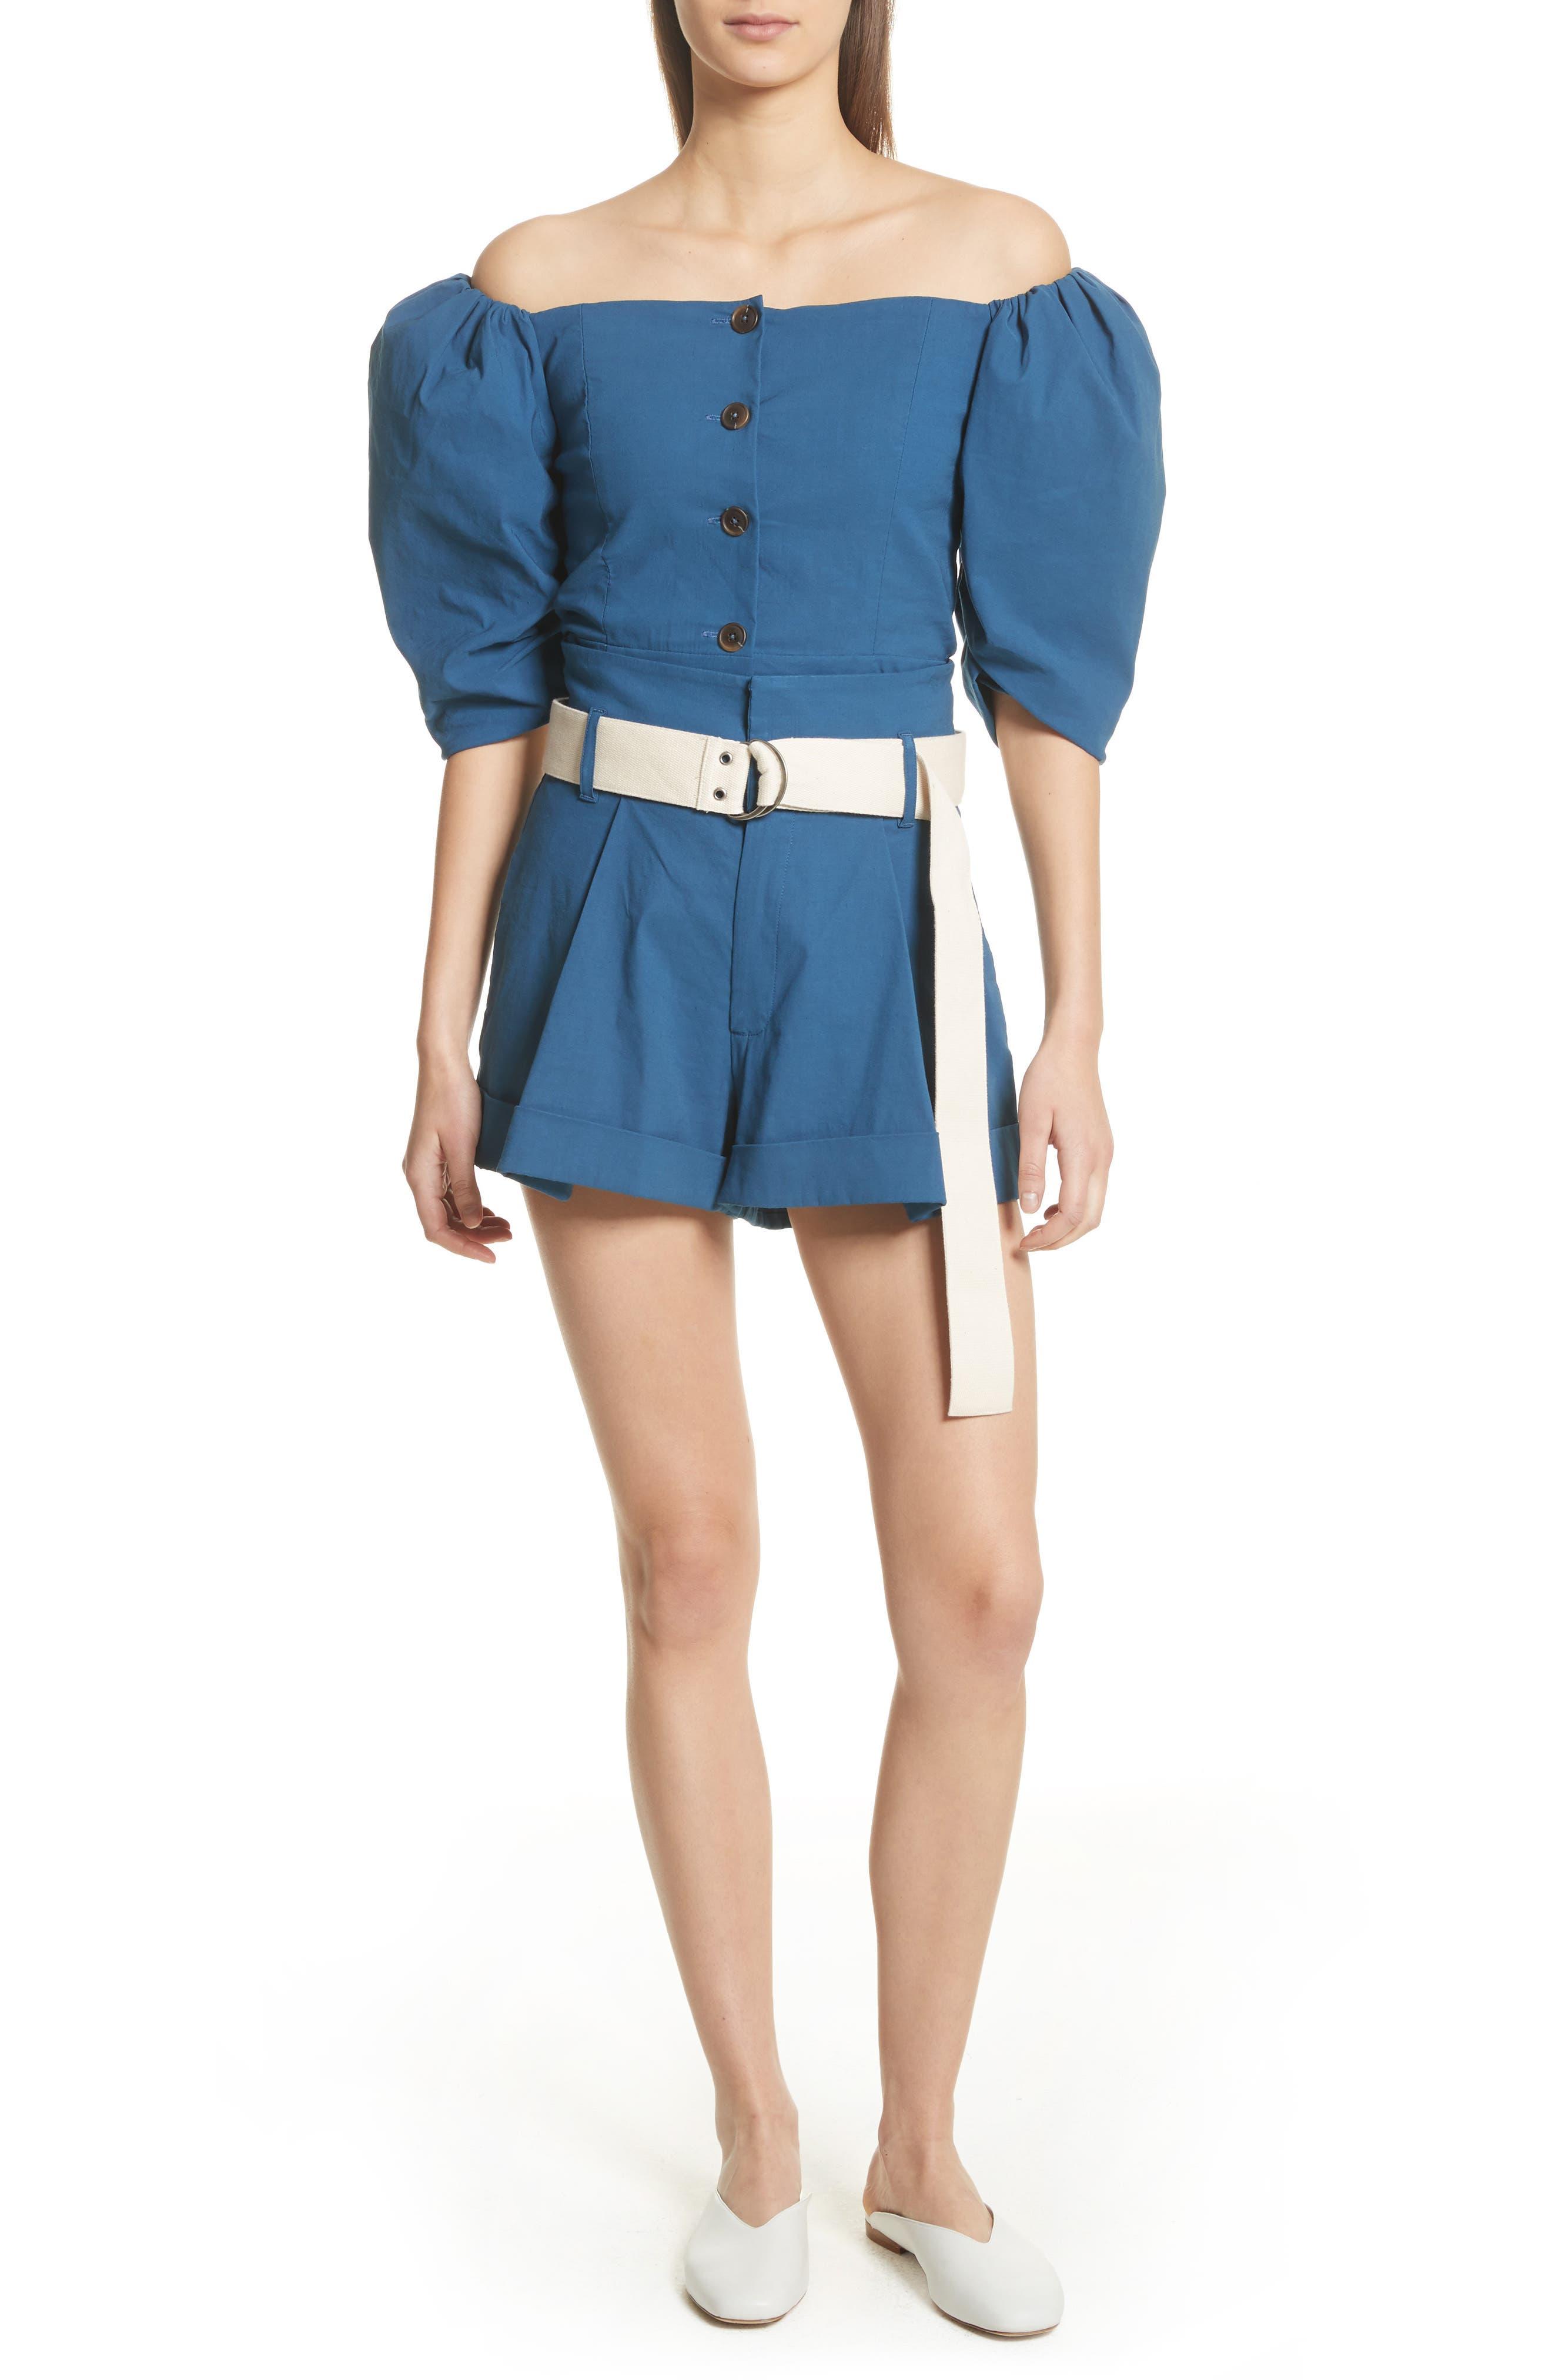 Poppy Belted Cotton & Linen Blend Shorts,                             Alternate thumbnail 7, color,                             400